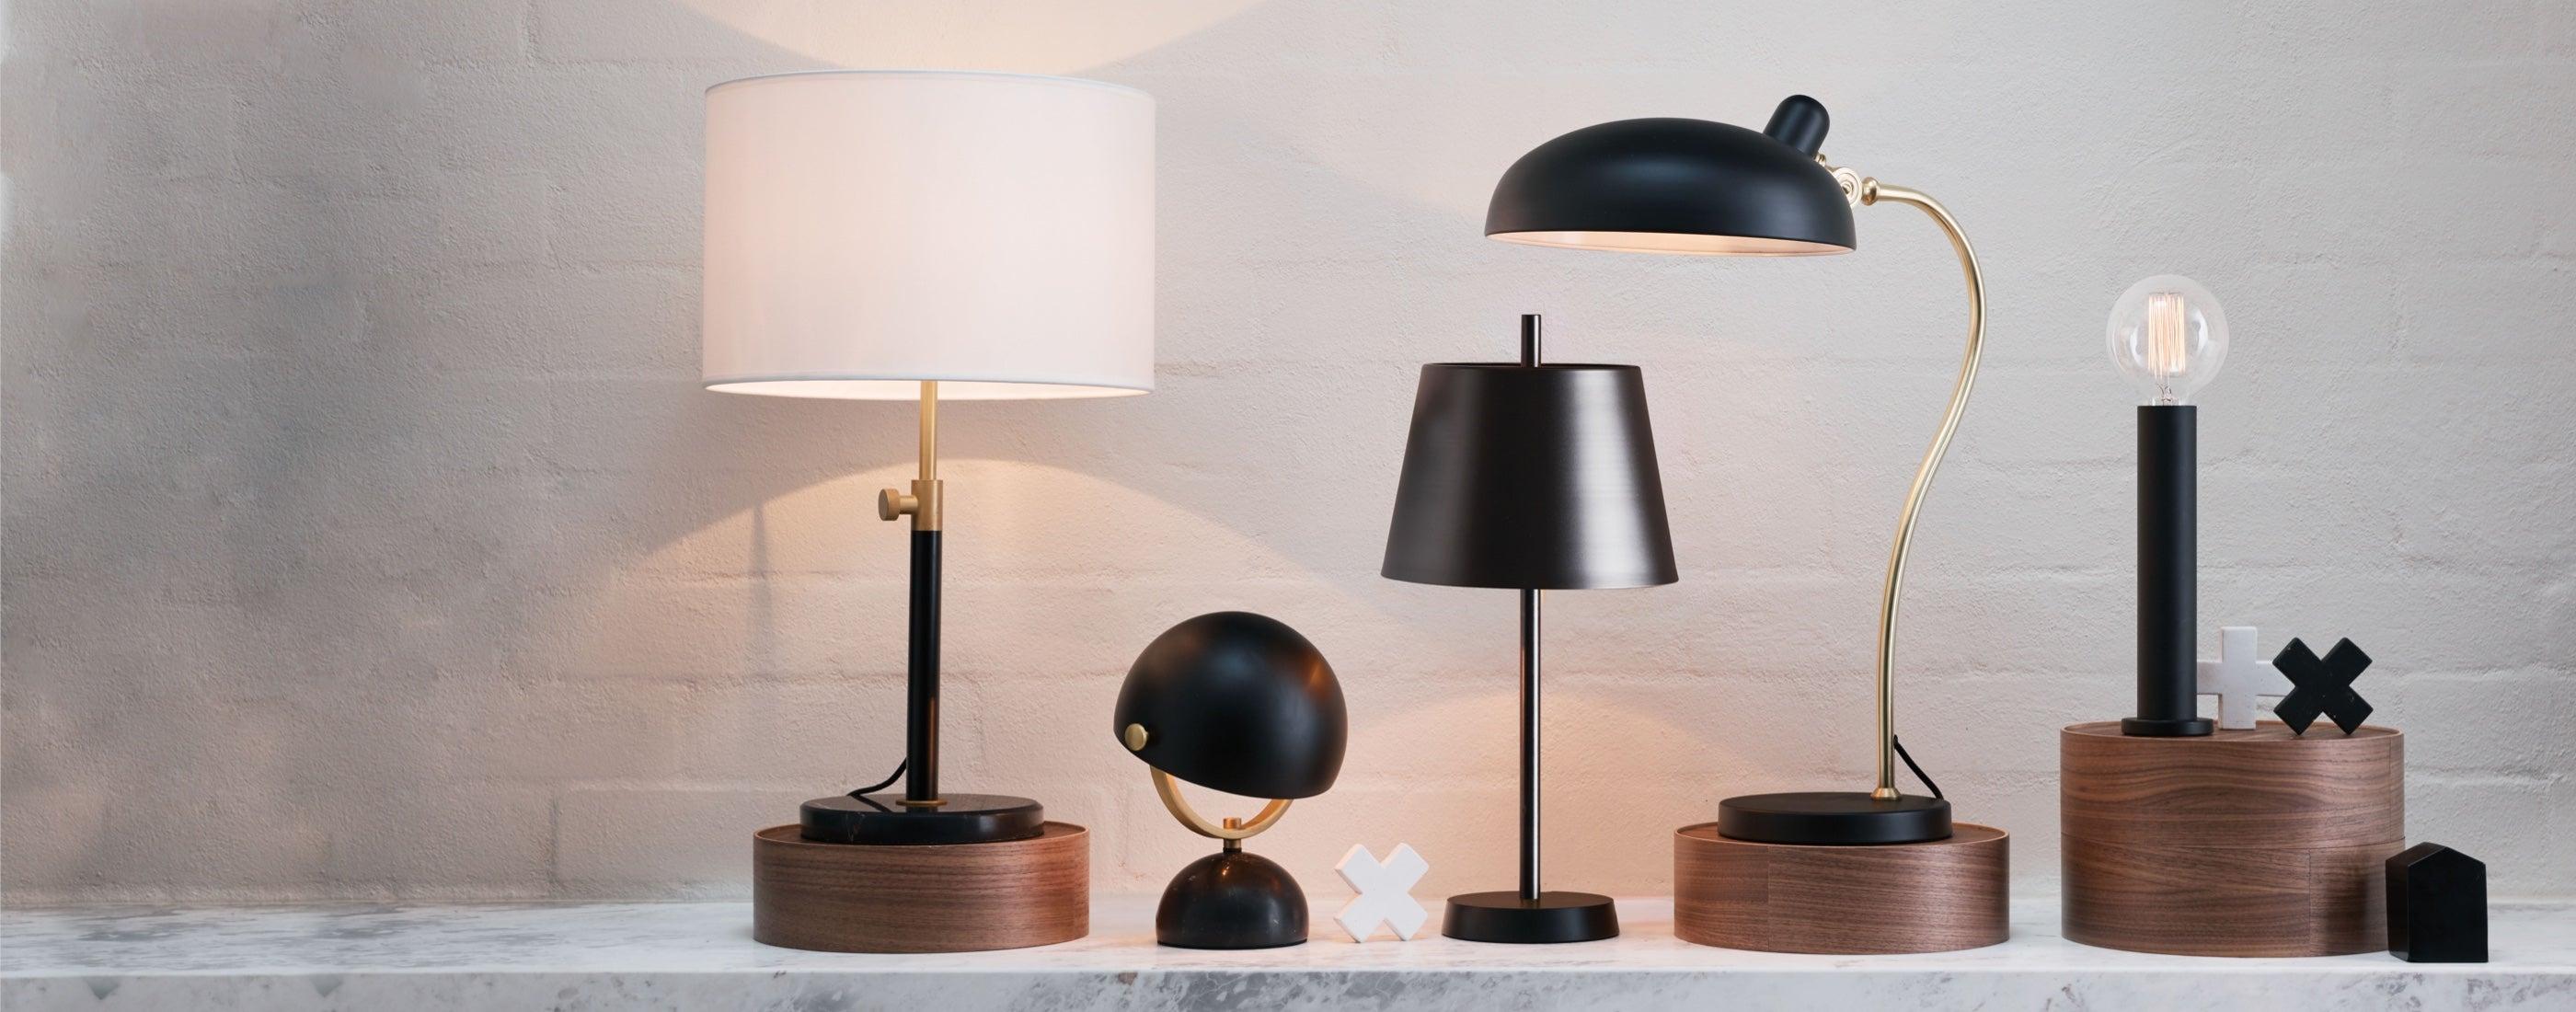 Table Lamps Beacon Lighting, Chandelier Bedside Lamps Australia